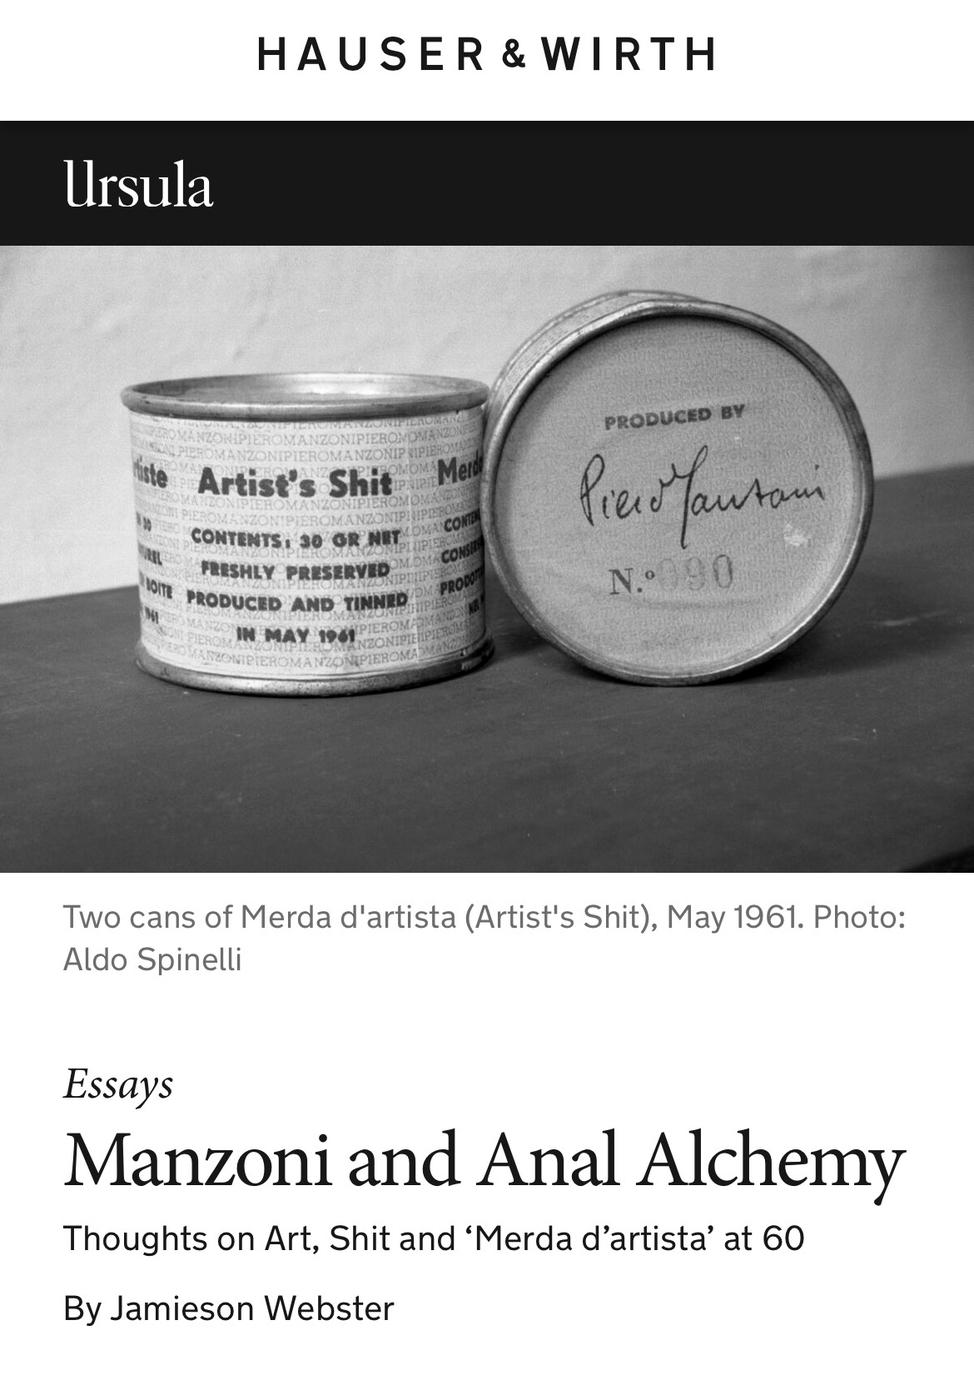 Manzoni and Anal Alchemy